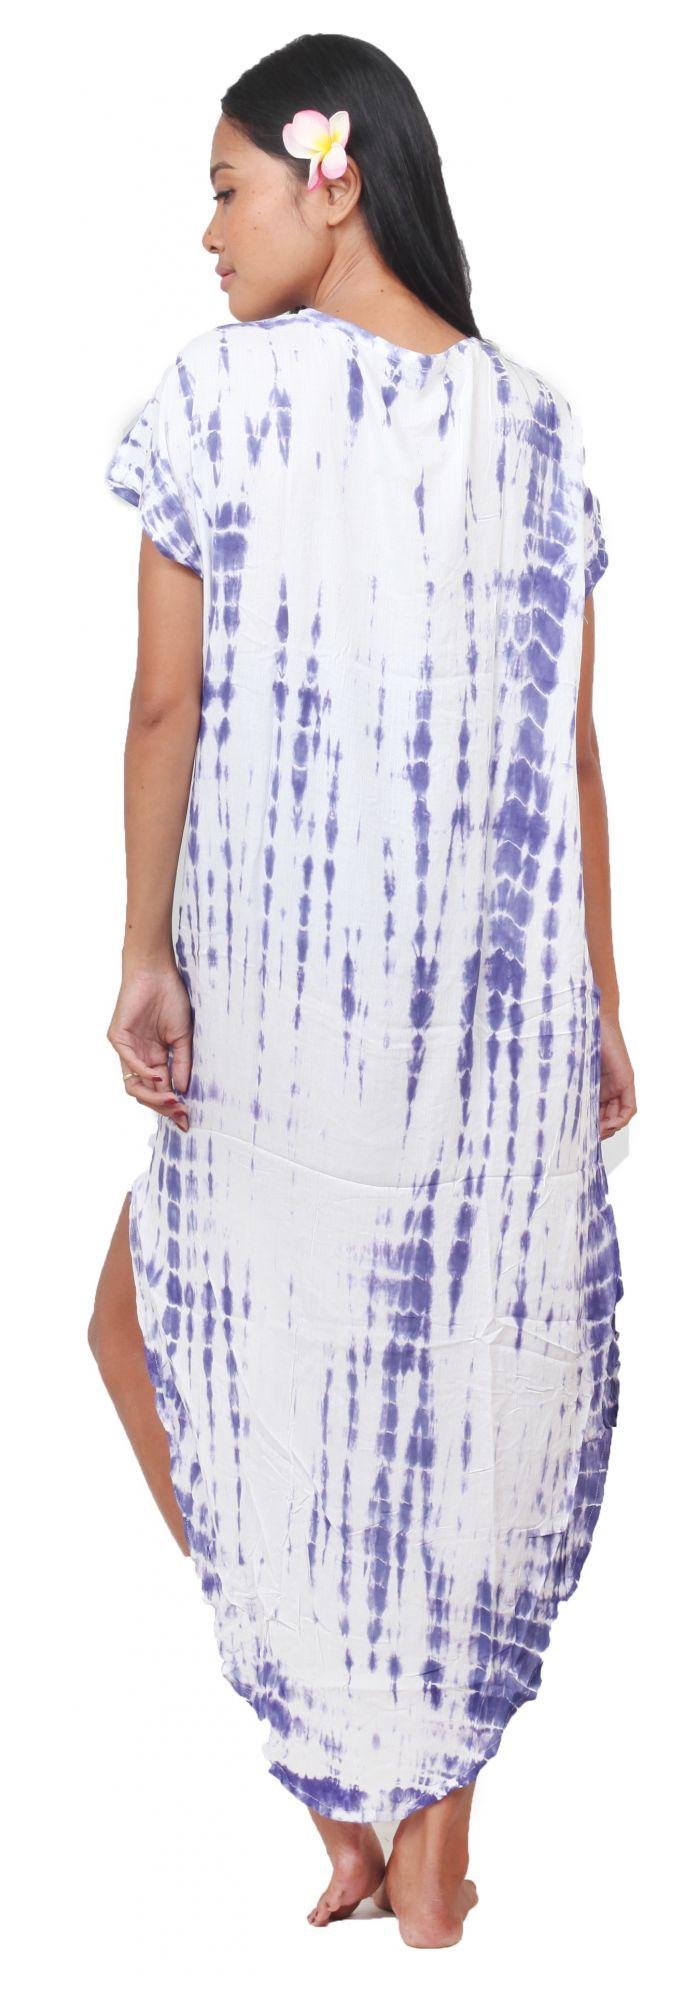 Robe de plage Lucia tie dye violet